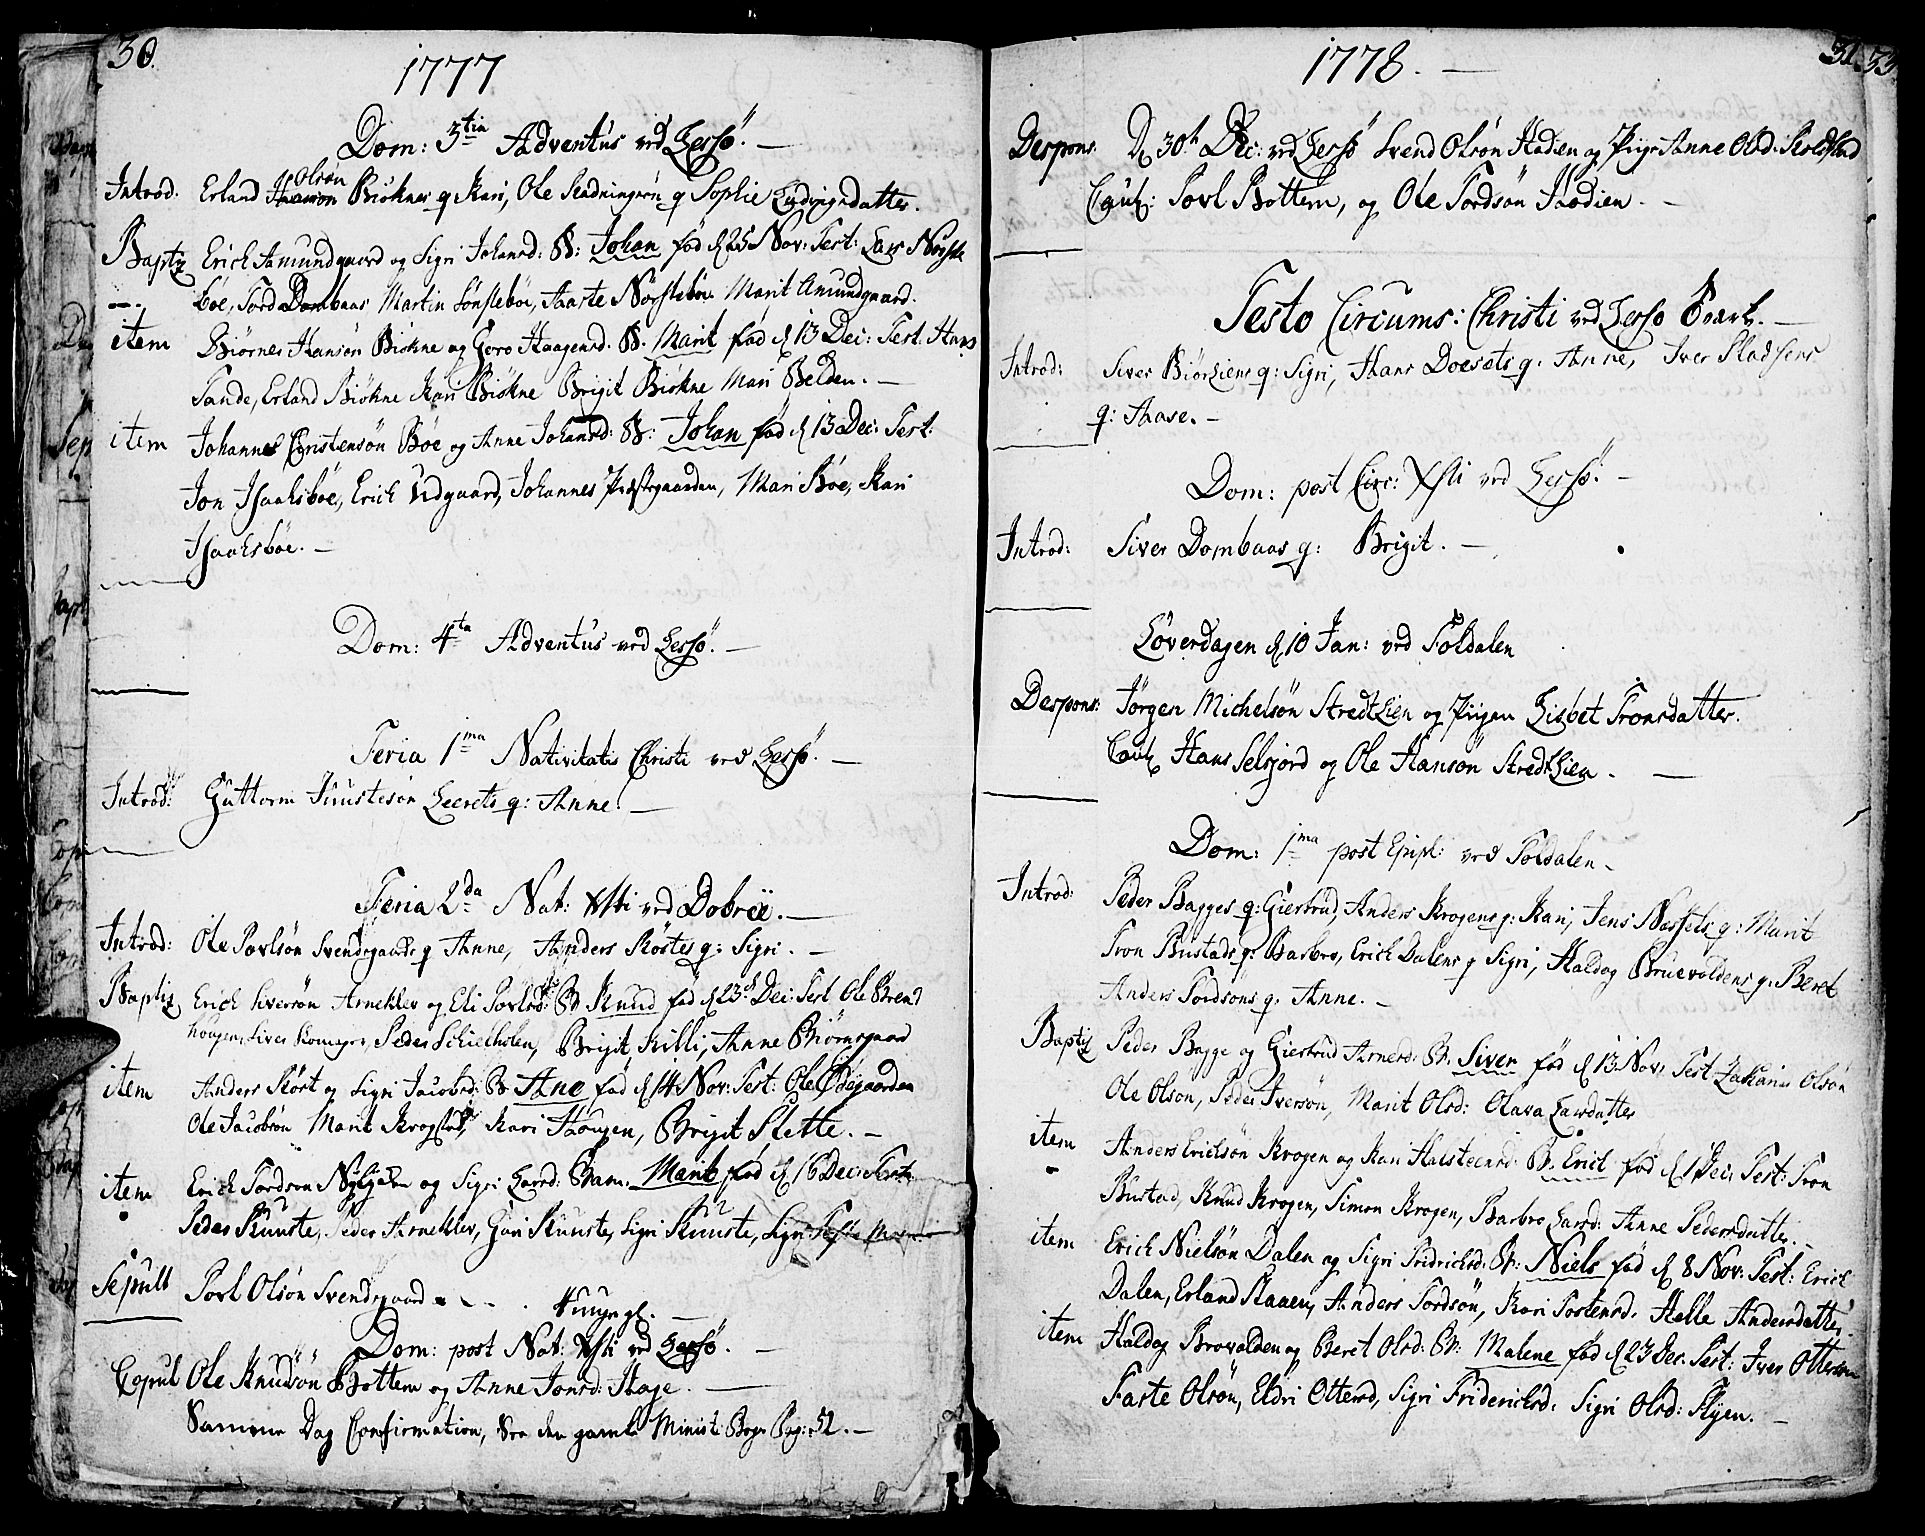 SAH, Lesja prestekontor, Ministerialbok nr. 3, 1777-1819, s. 30-31